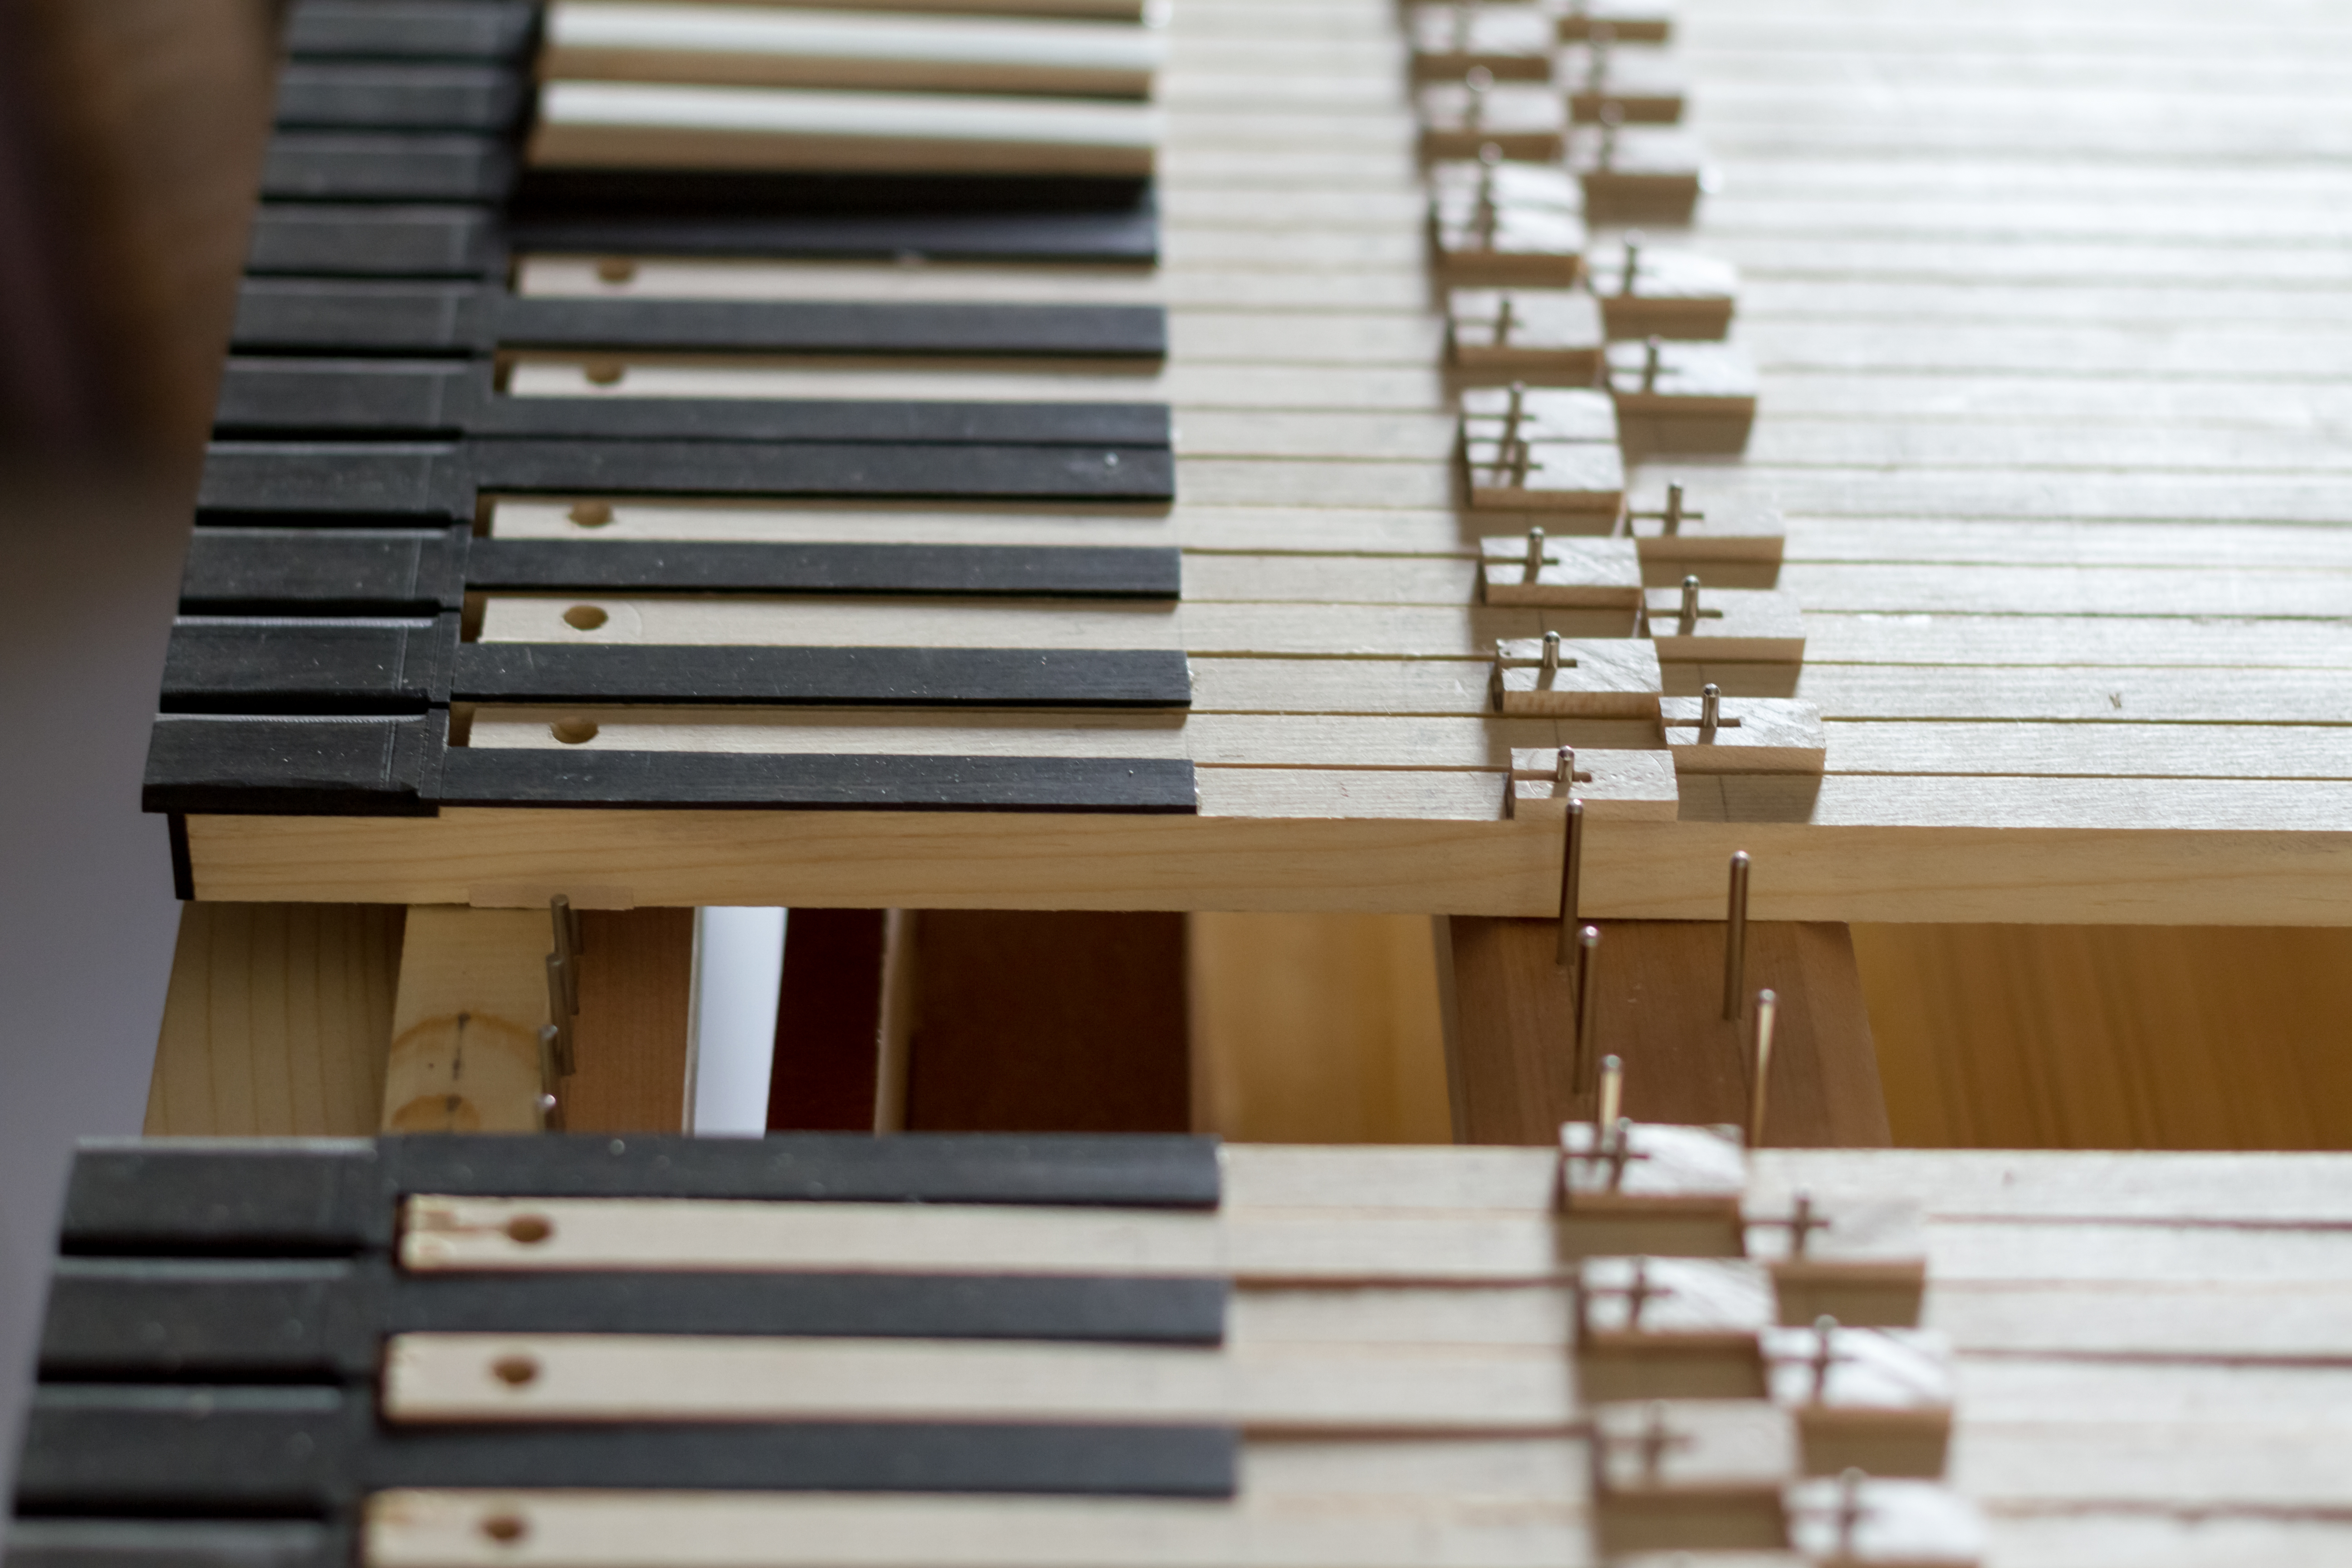 Clavier en construction - Opus 2